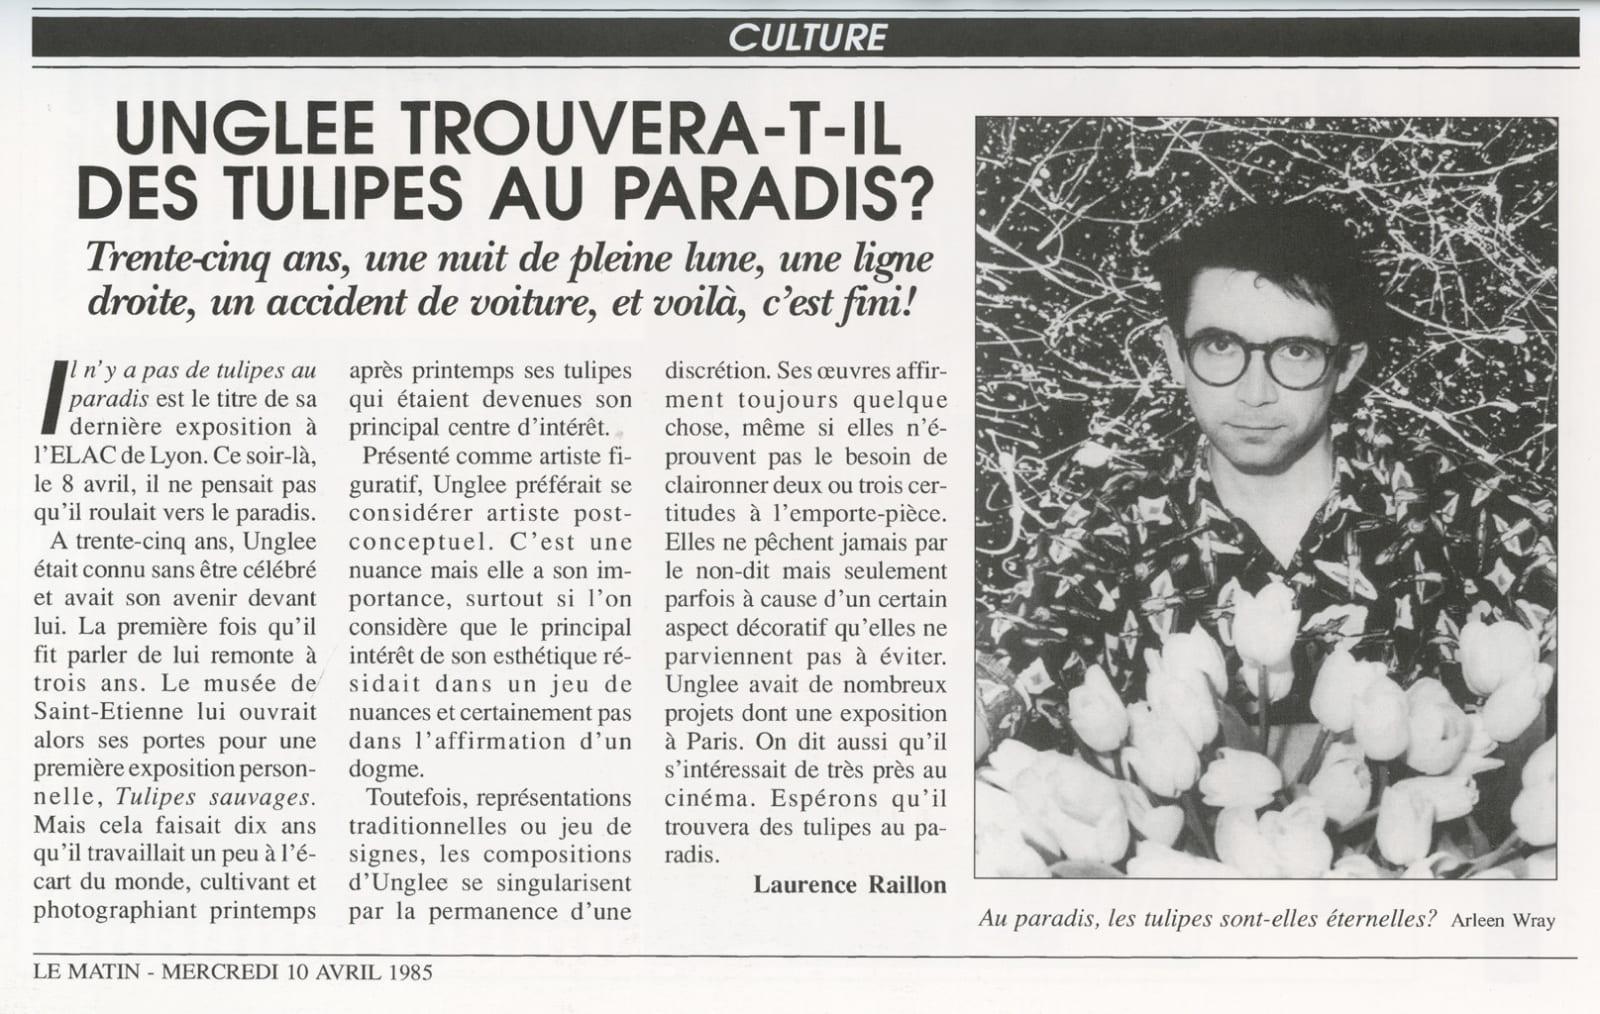 Unglee, Unglee trouvera-t-il des tulipes au paradis, Paris 1993, 1995